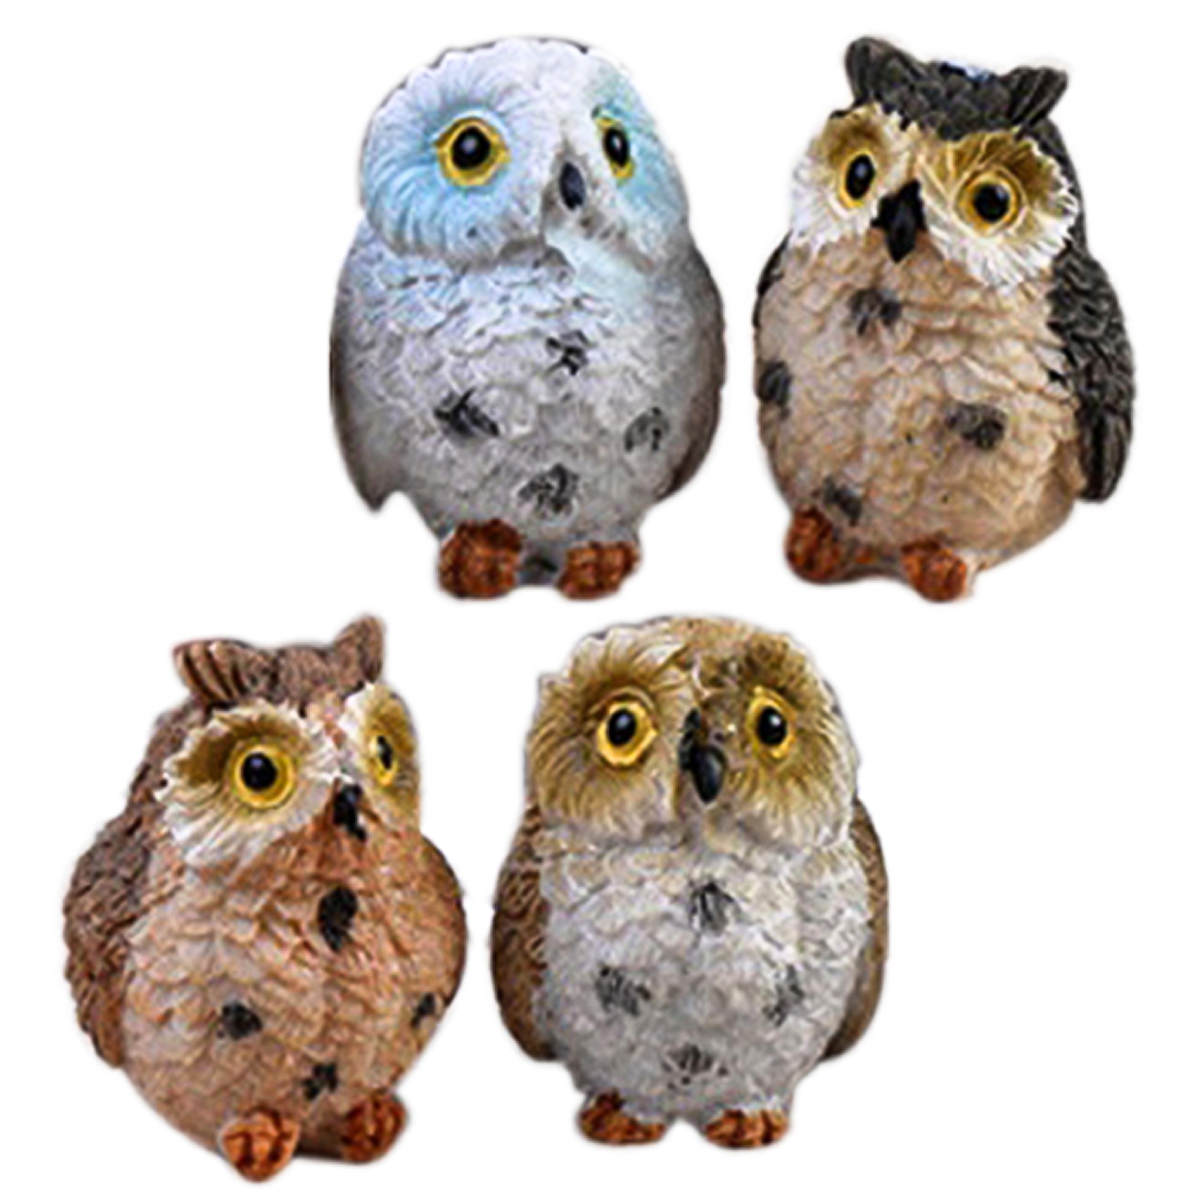 Landscape Owl Doll Resin Fairy Home Garden DIY Decor Micro Ornaments DecorationLandscape Owl Doll Resin Fairy Home Garden DIY Decor Micro Ornaments Decoration